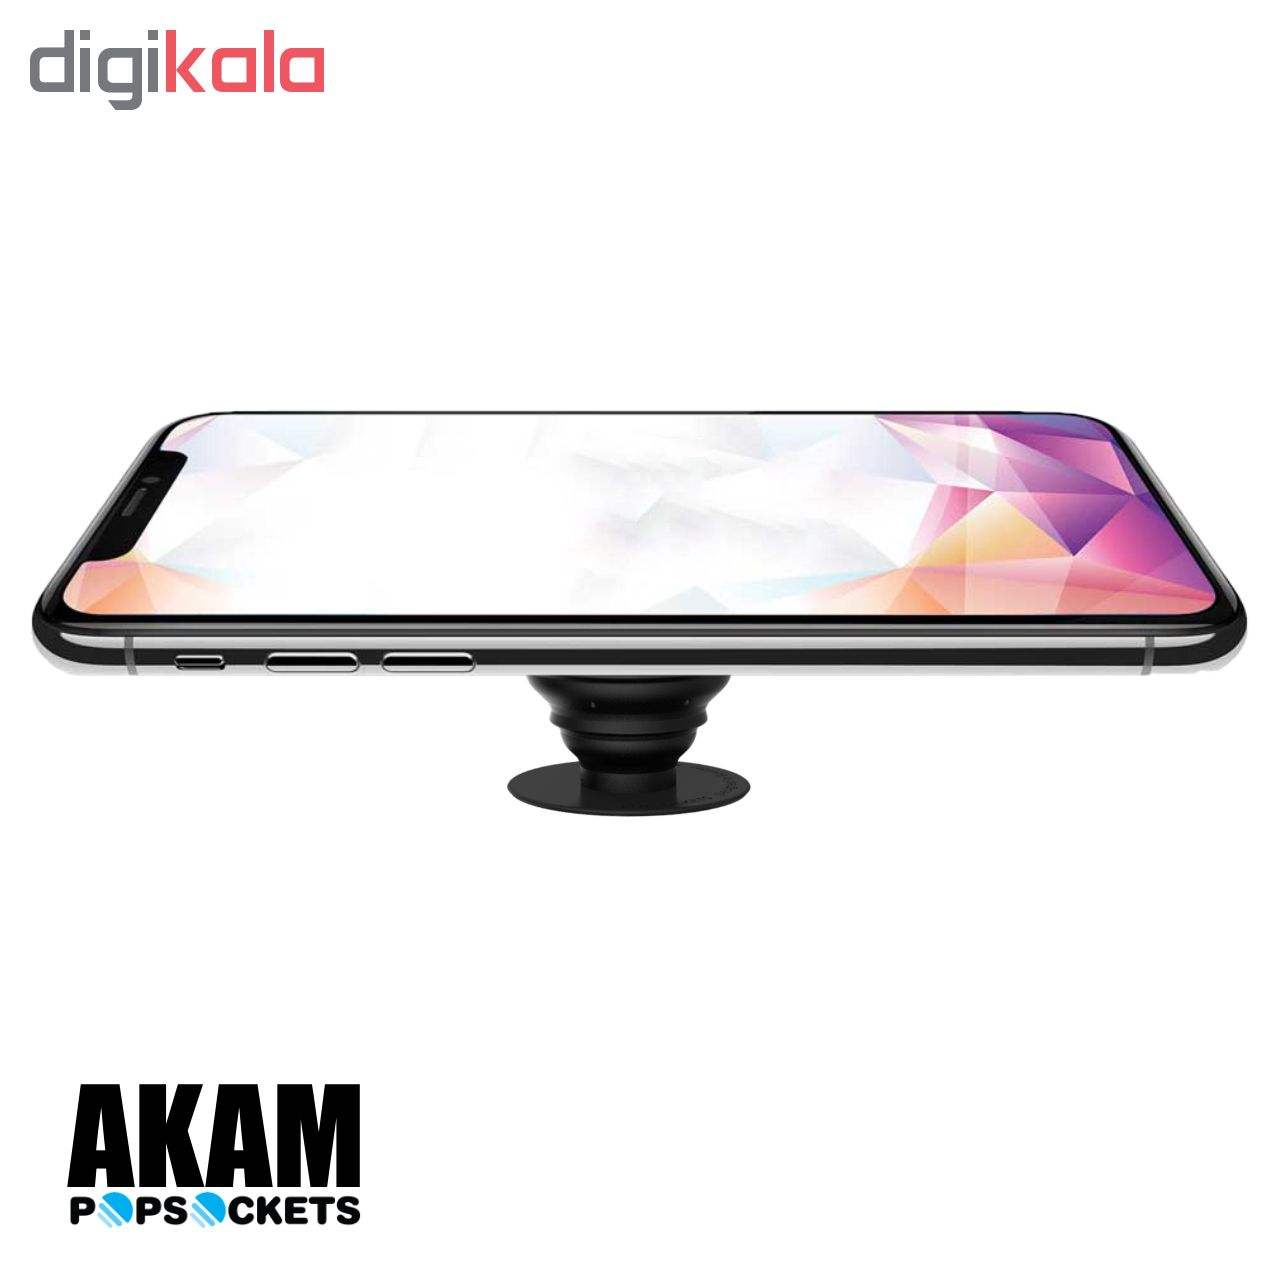 پایه نگهدارنده گوشی موبایل پاپ سوکت آکام مدل APS0079 main 1 9